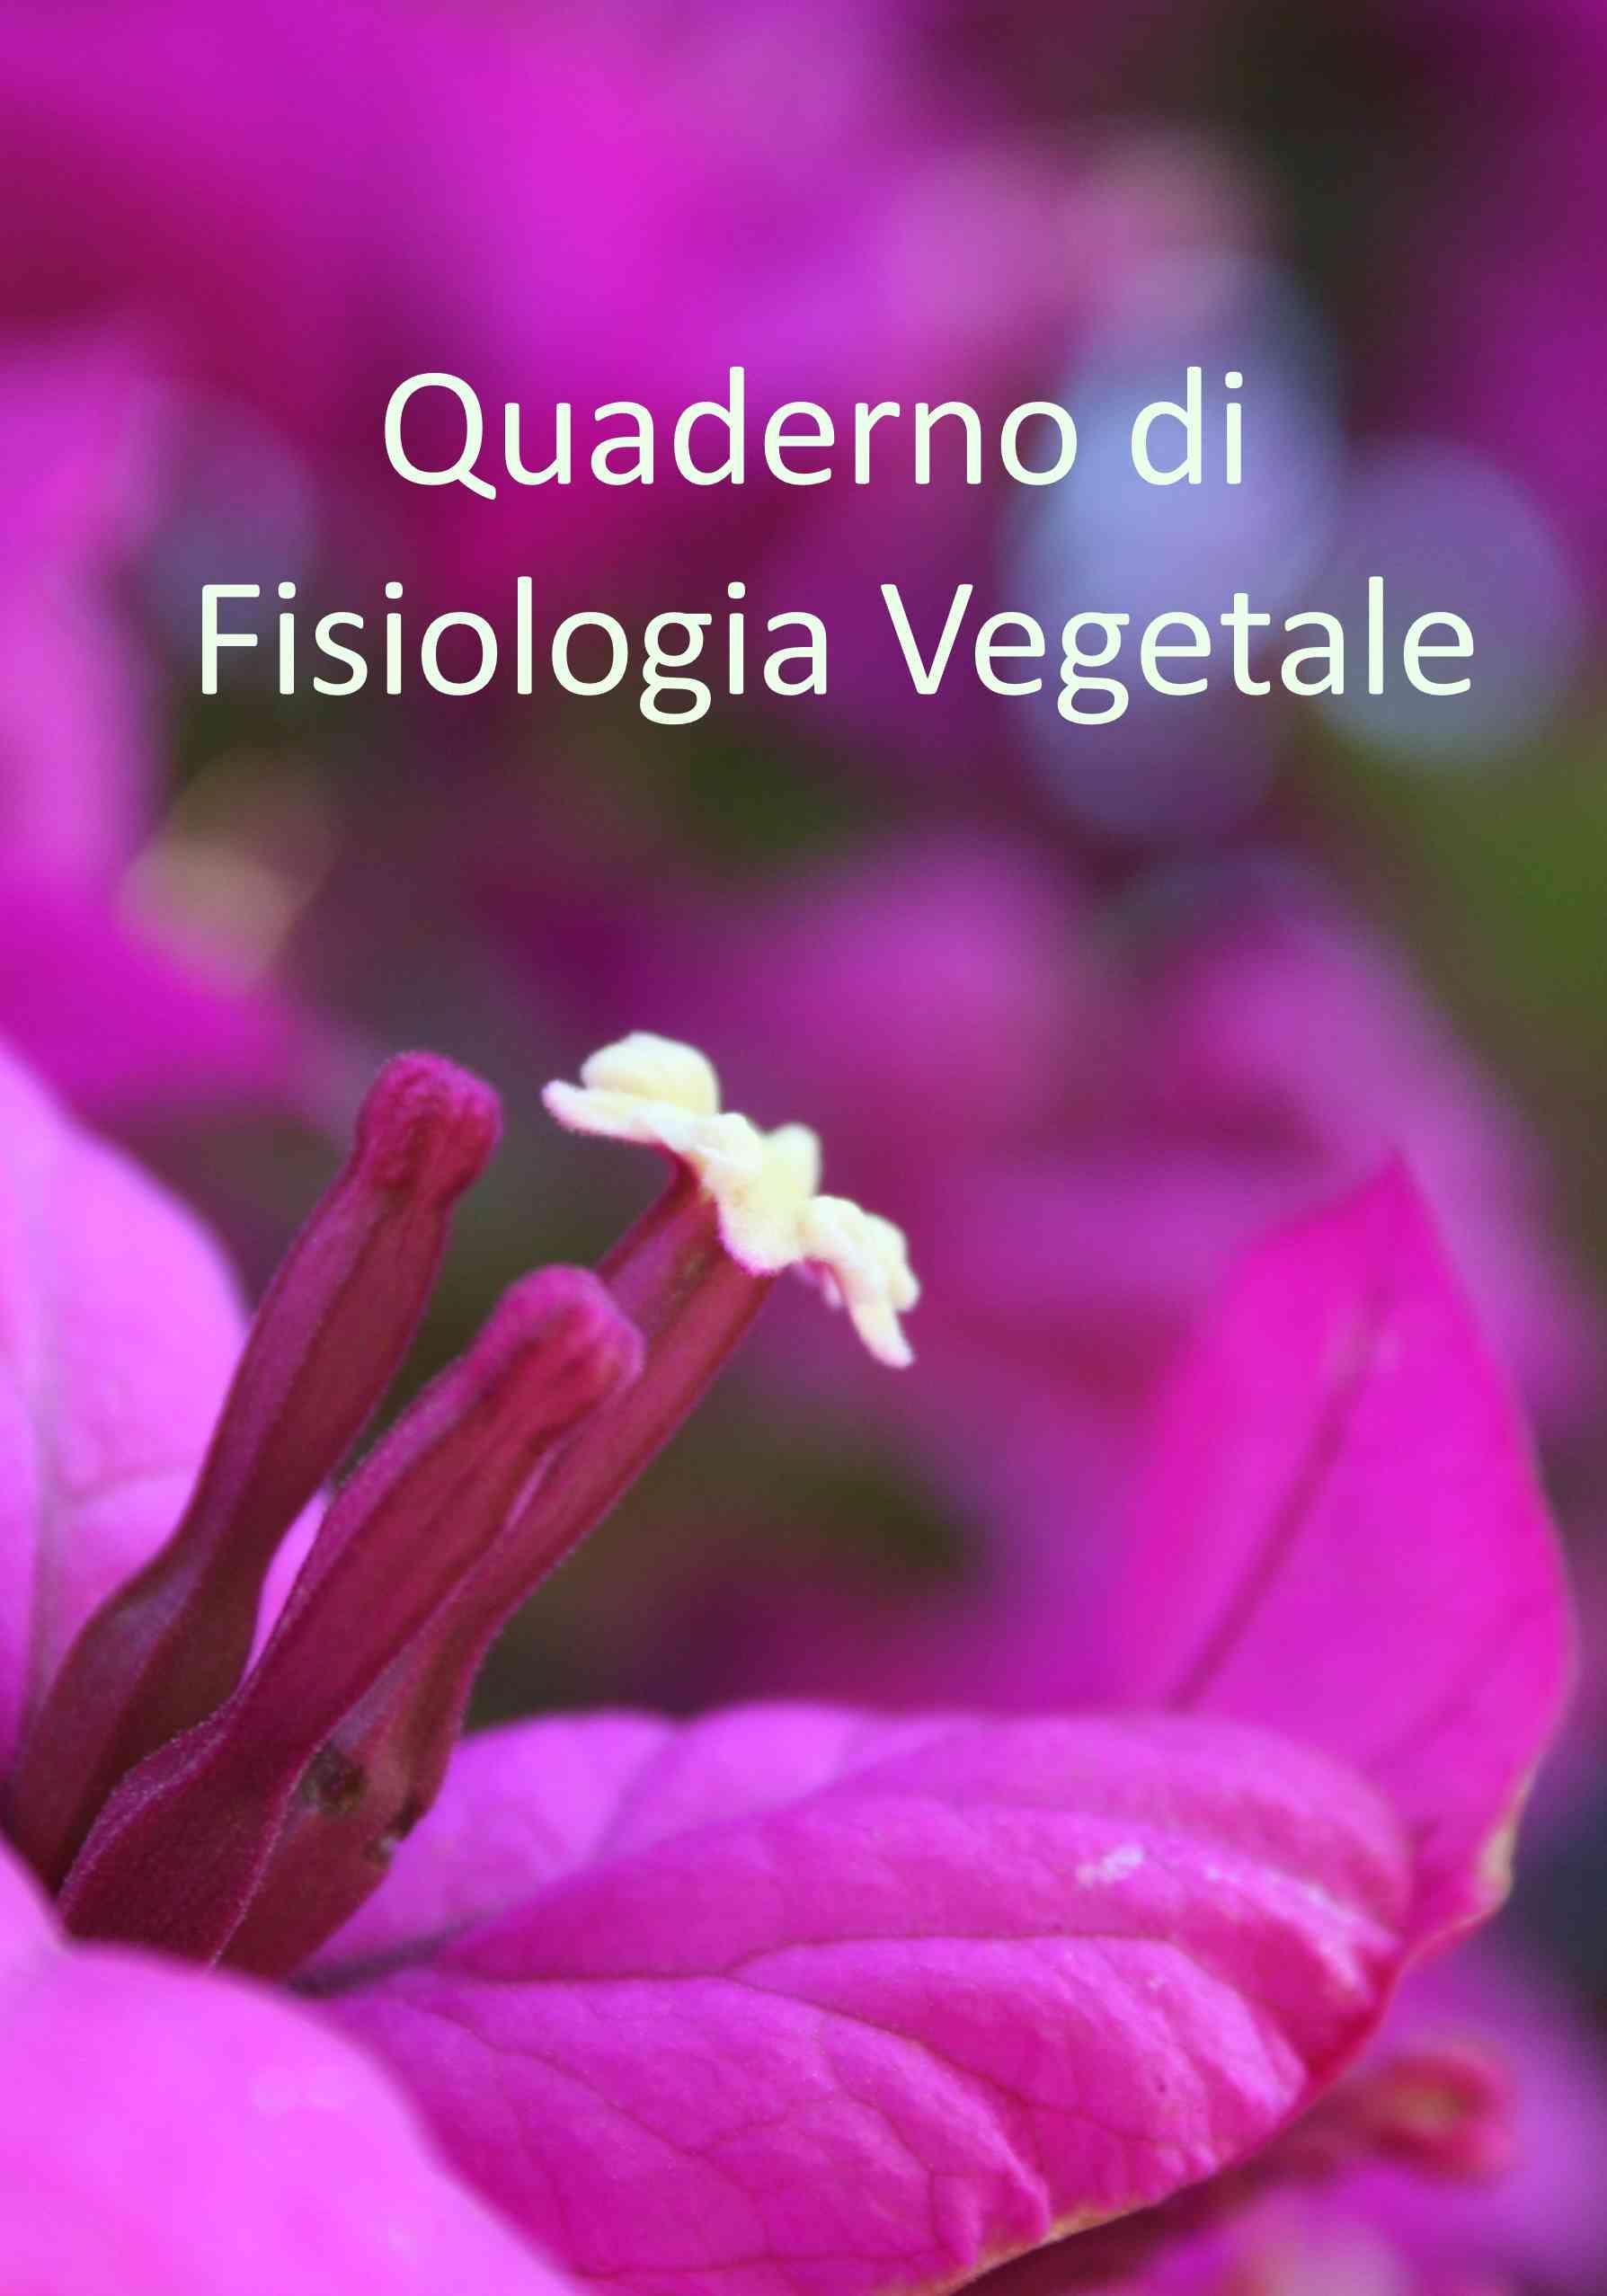 Copertina Libro Fisiologia Vegetale